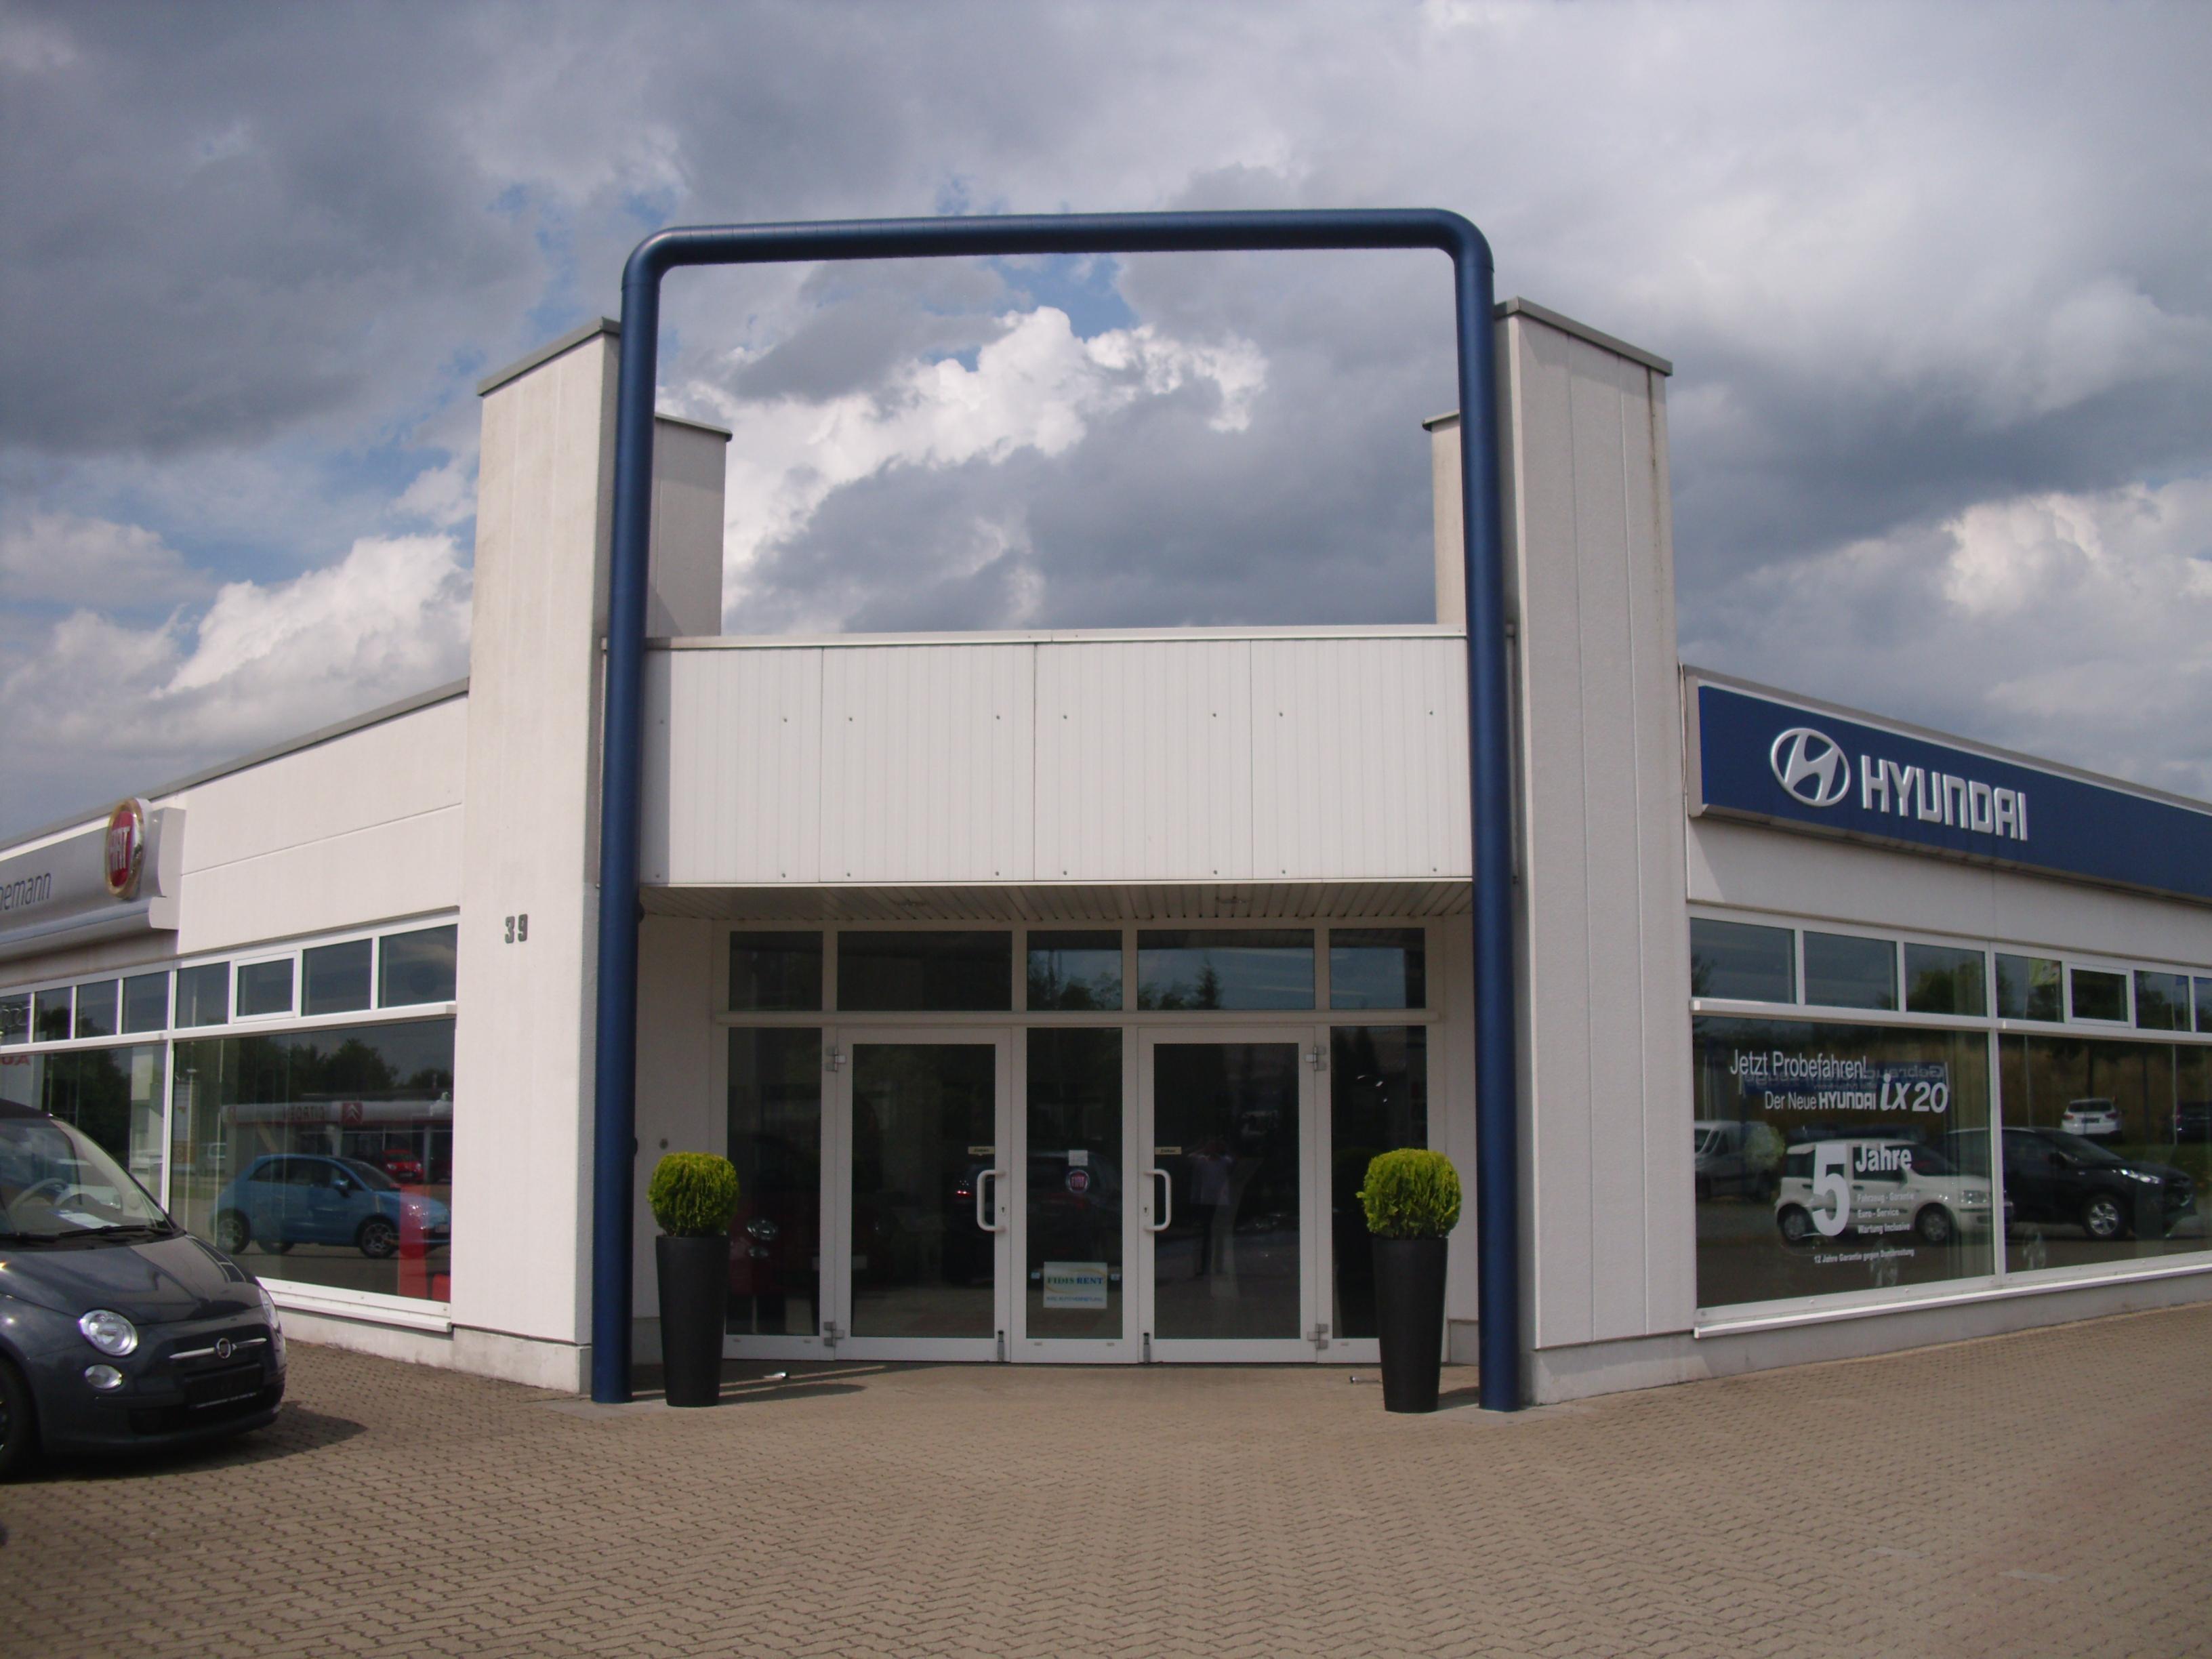 Autogas Wernigerode